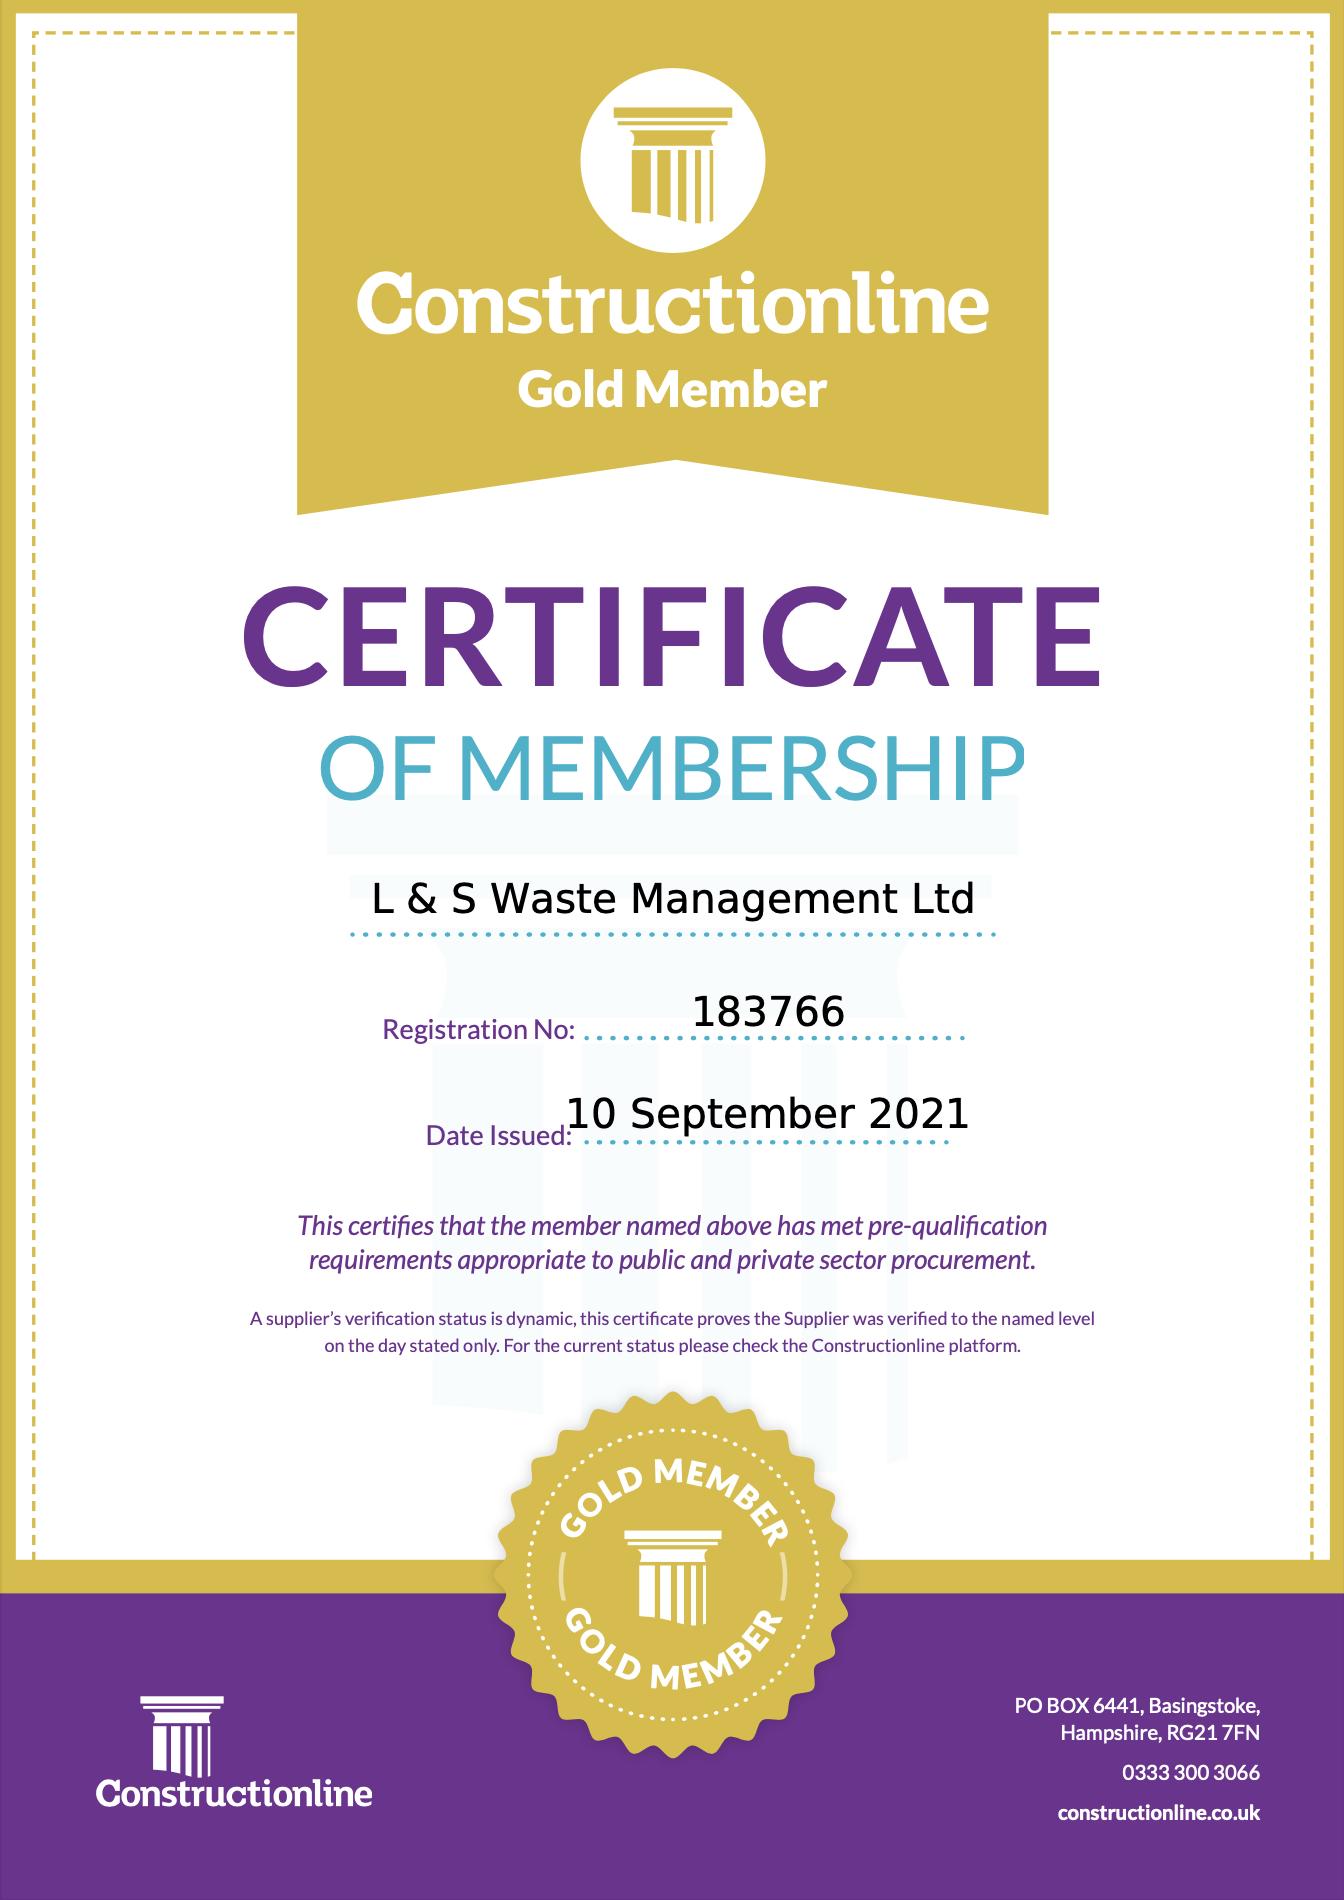 L&S Waste Management - Constructionline Gold Member